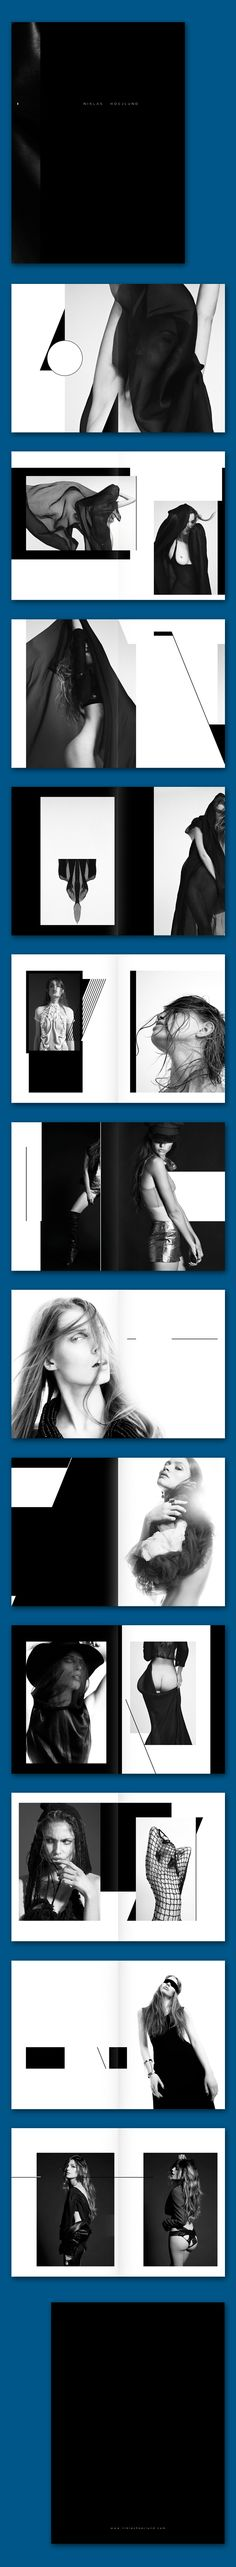 Niklas Hoejlund Photobook (Proposal) by Paulo Brandao Melo, via Behance